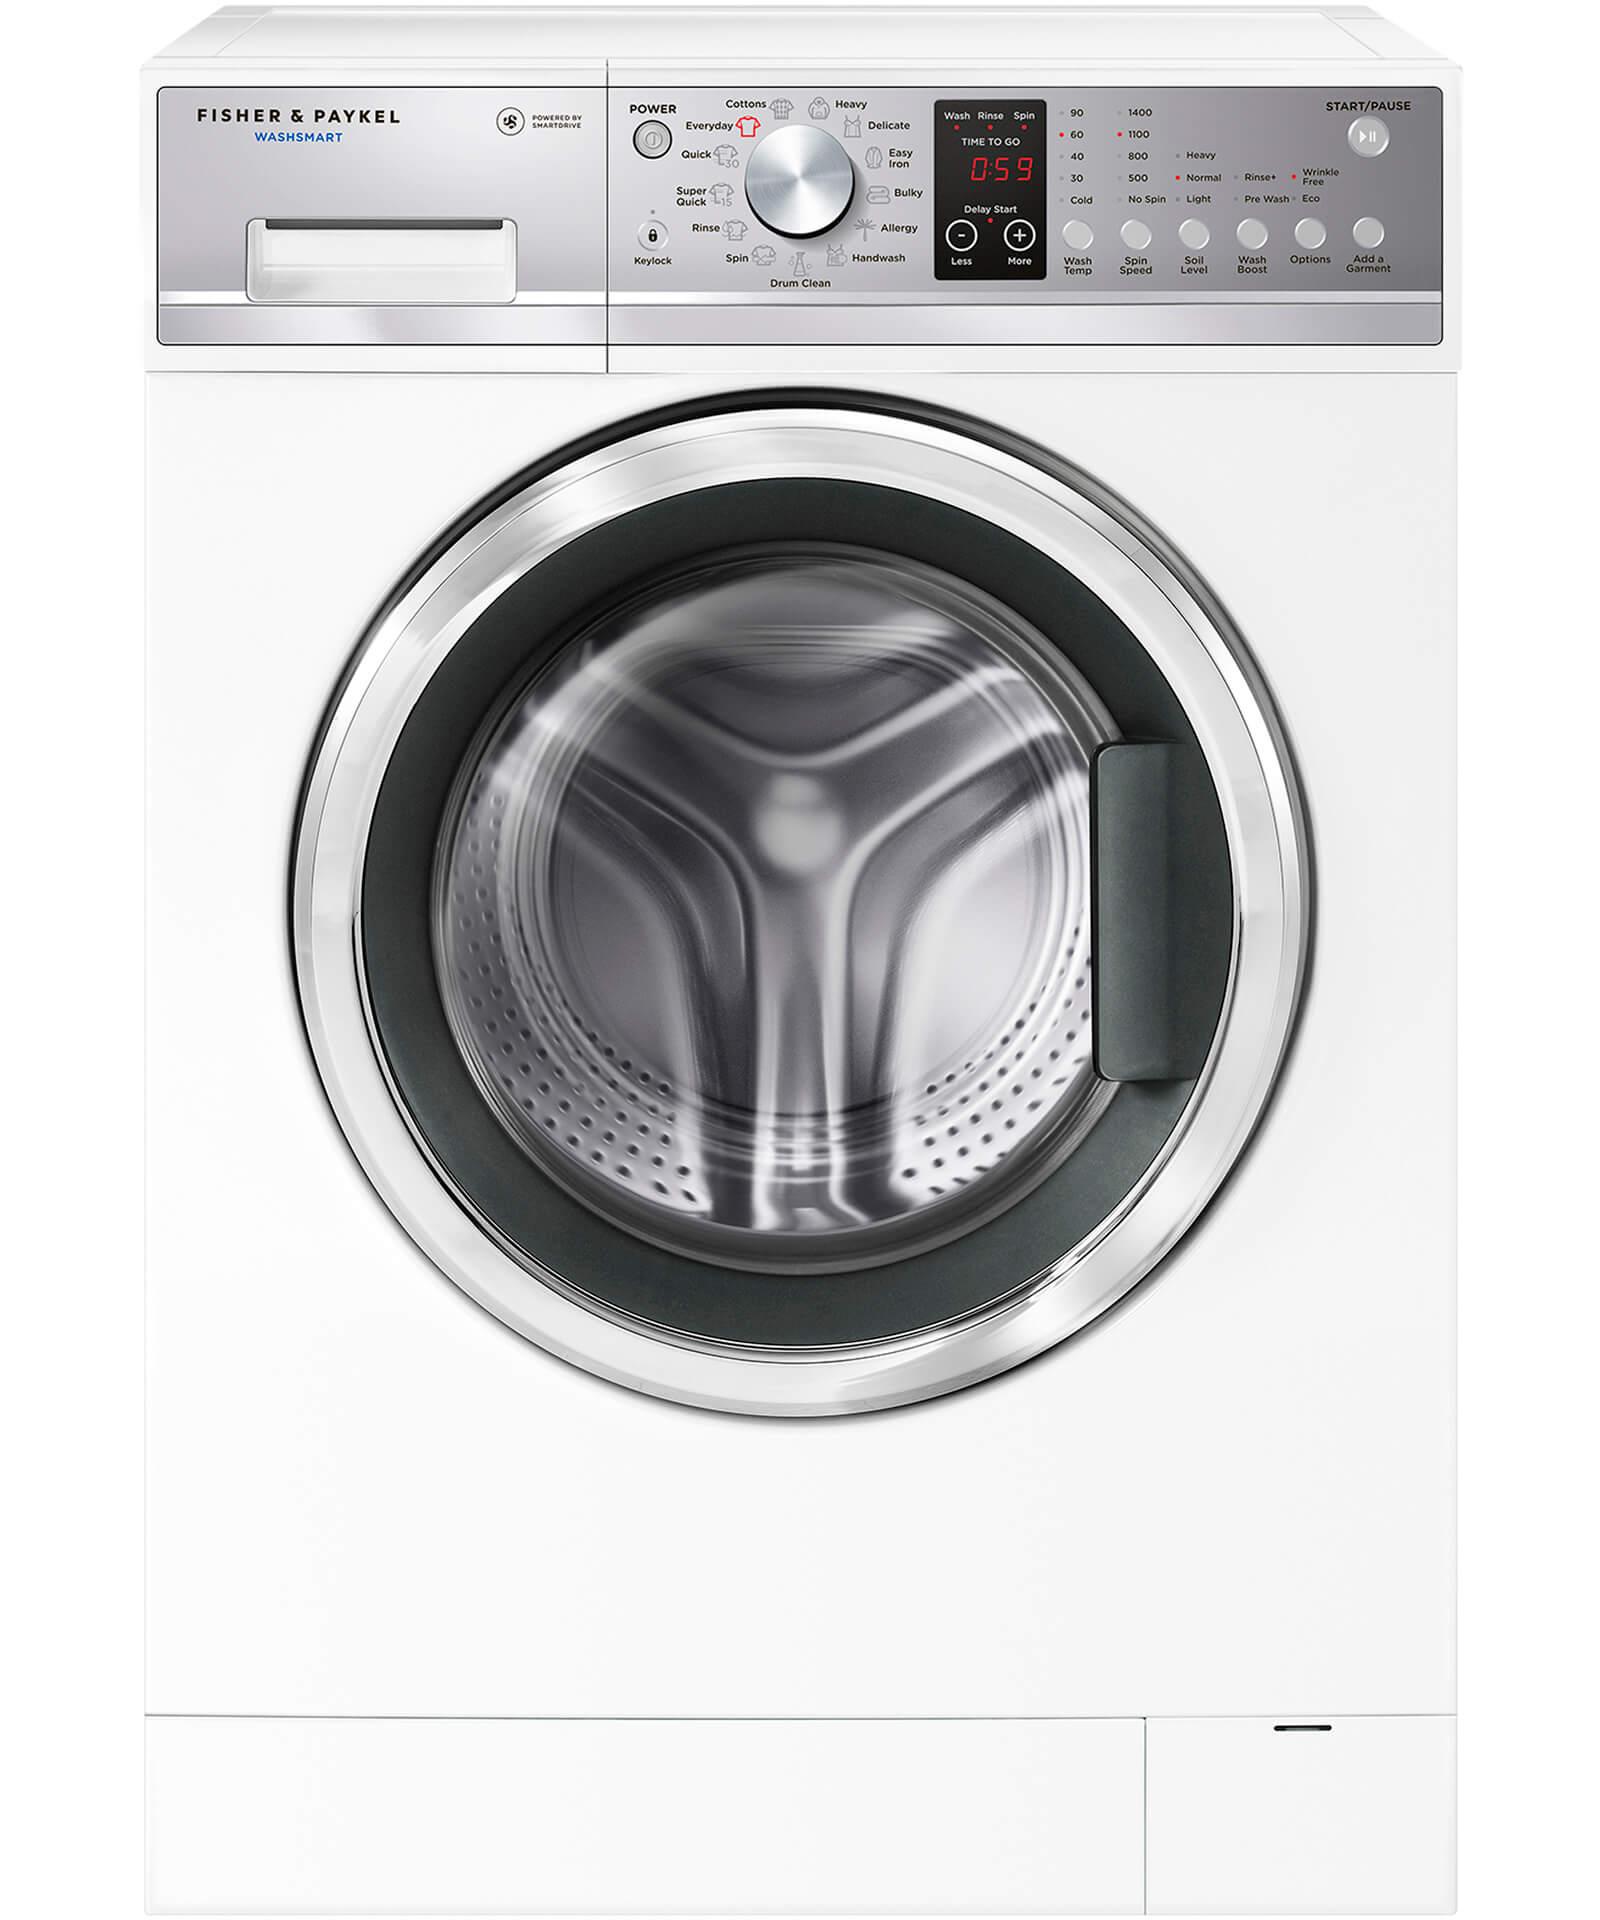 Wh8560p2 Front Loader Washing Machine 85kg Washsmart Fisher